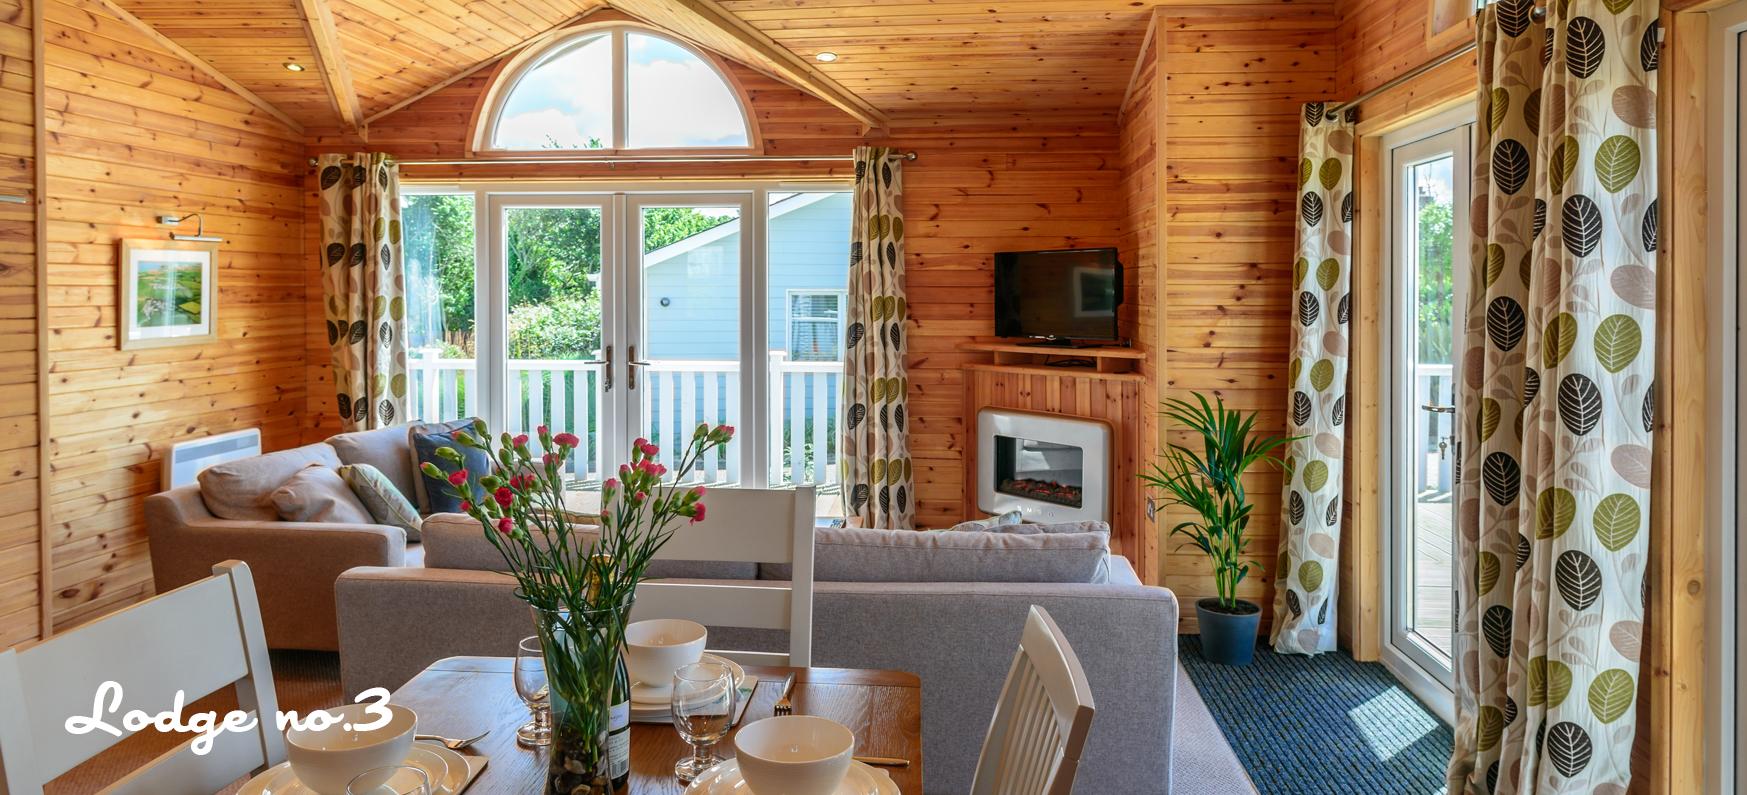 Lodge 3 holiday cottage